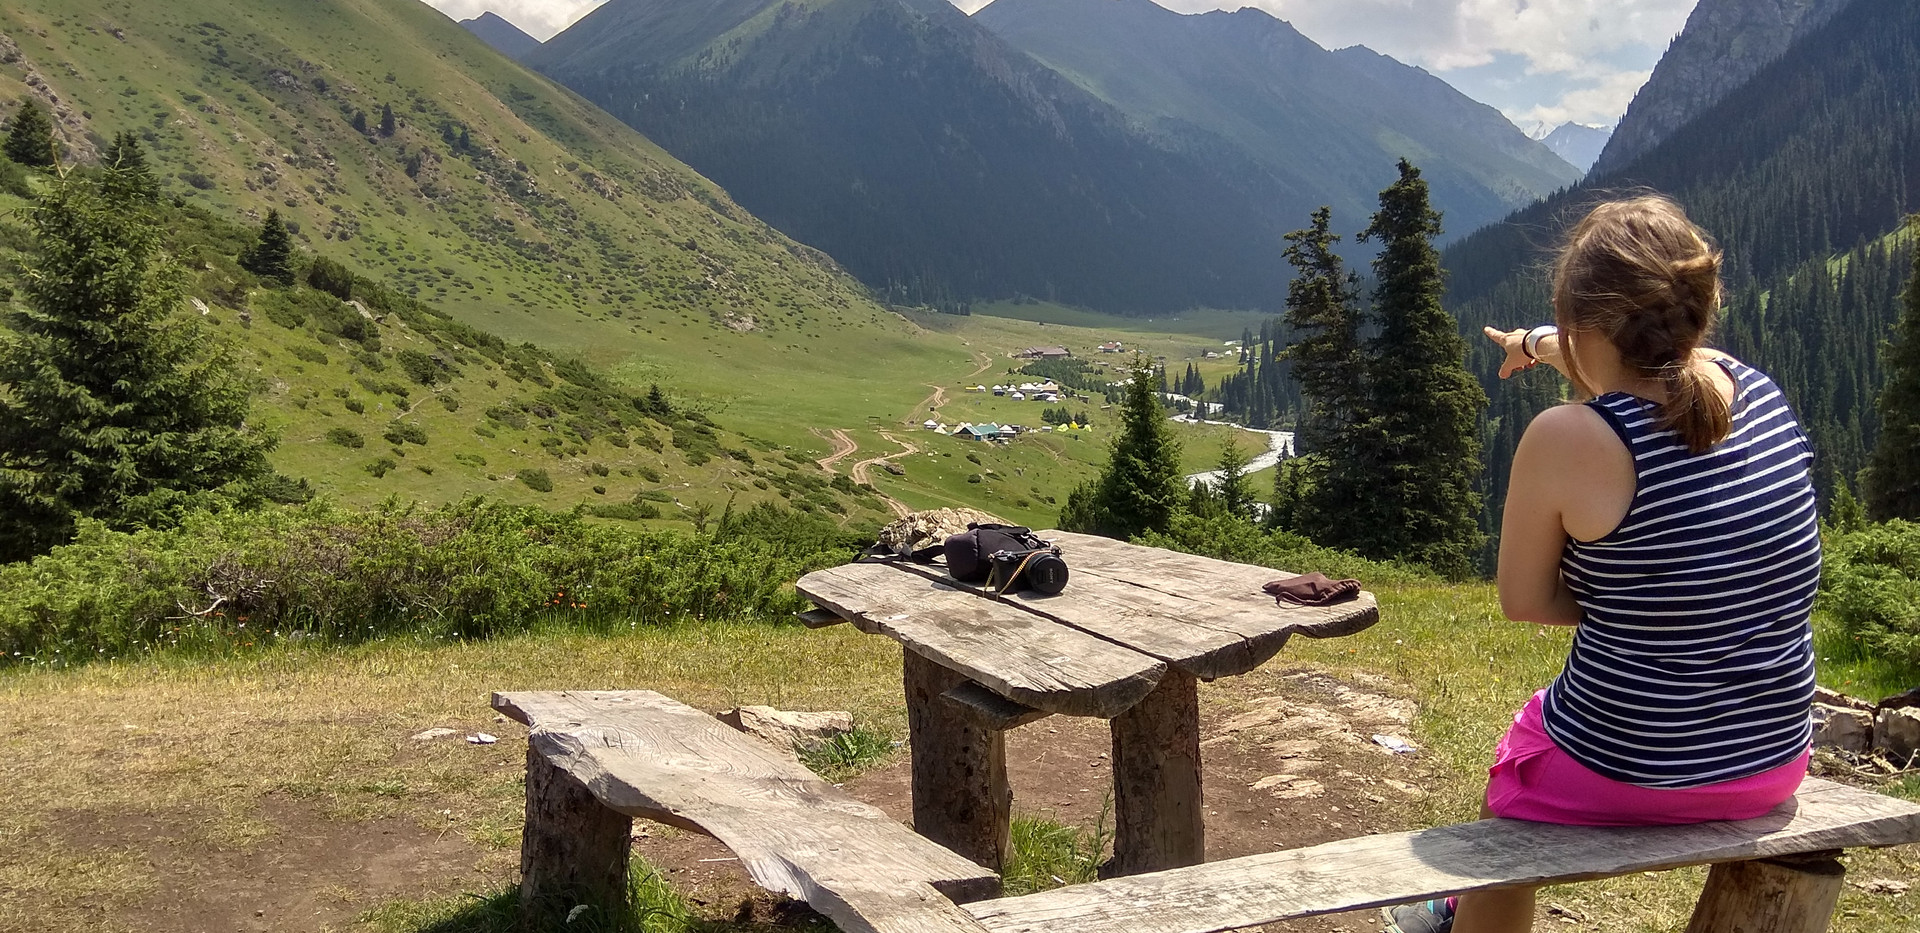 Altyn Arashan-Kyrgyzstan country